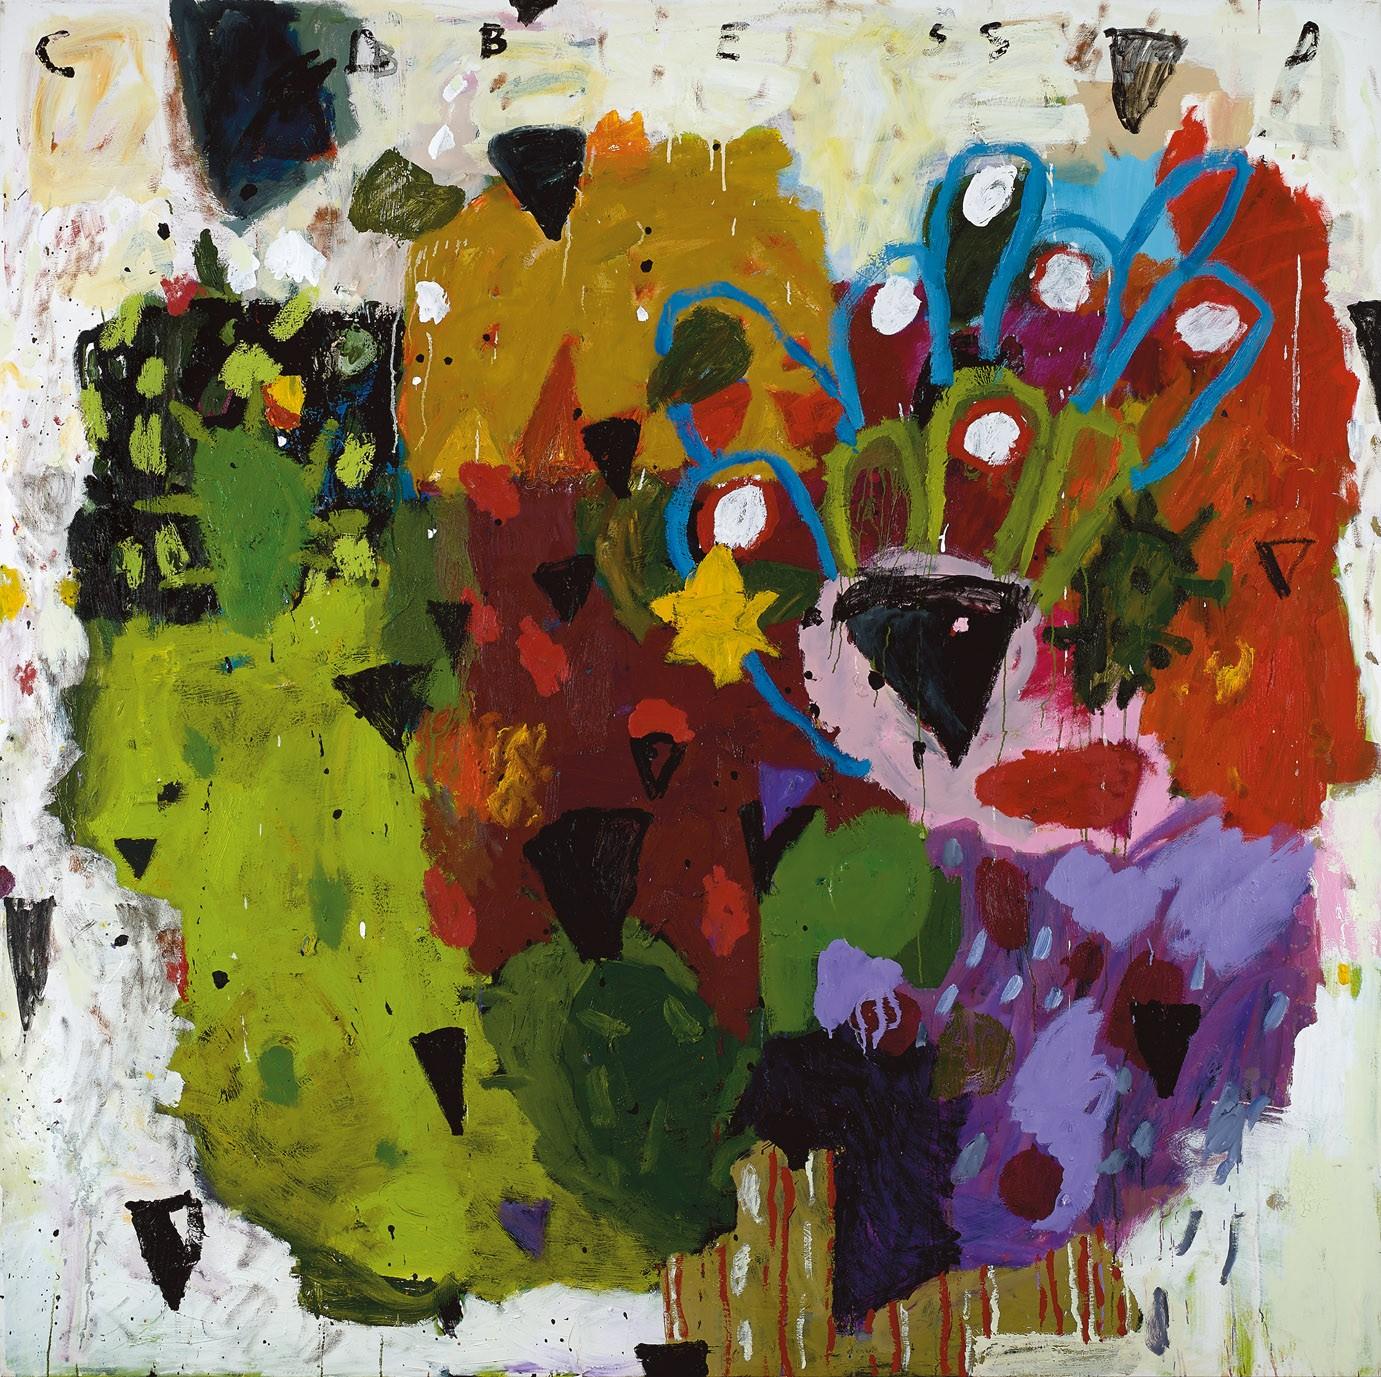 Amit Cabessa, 2018, Oil on canvas 200 x 200 cm 16,000$